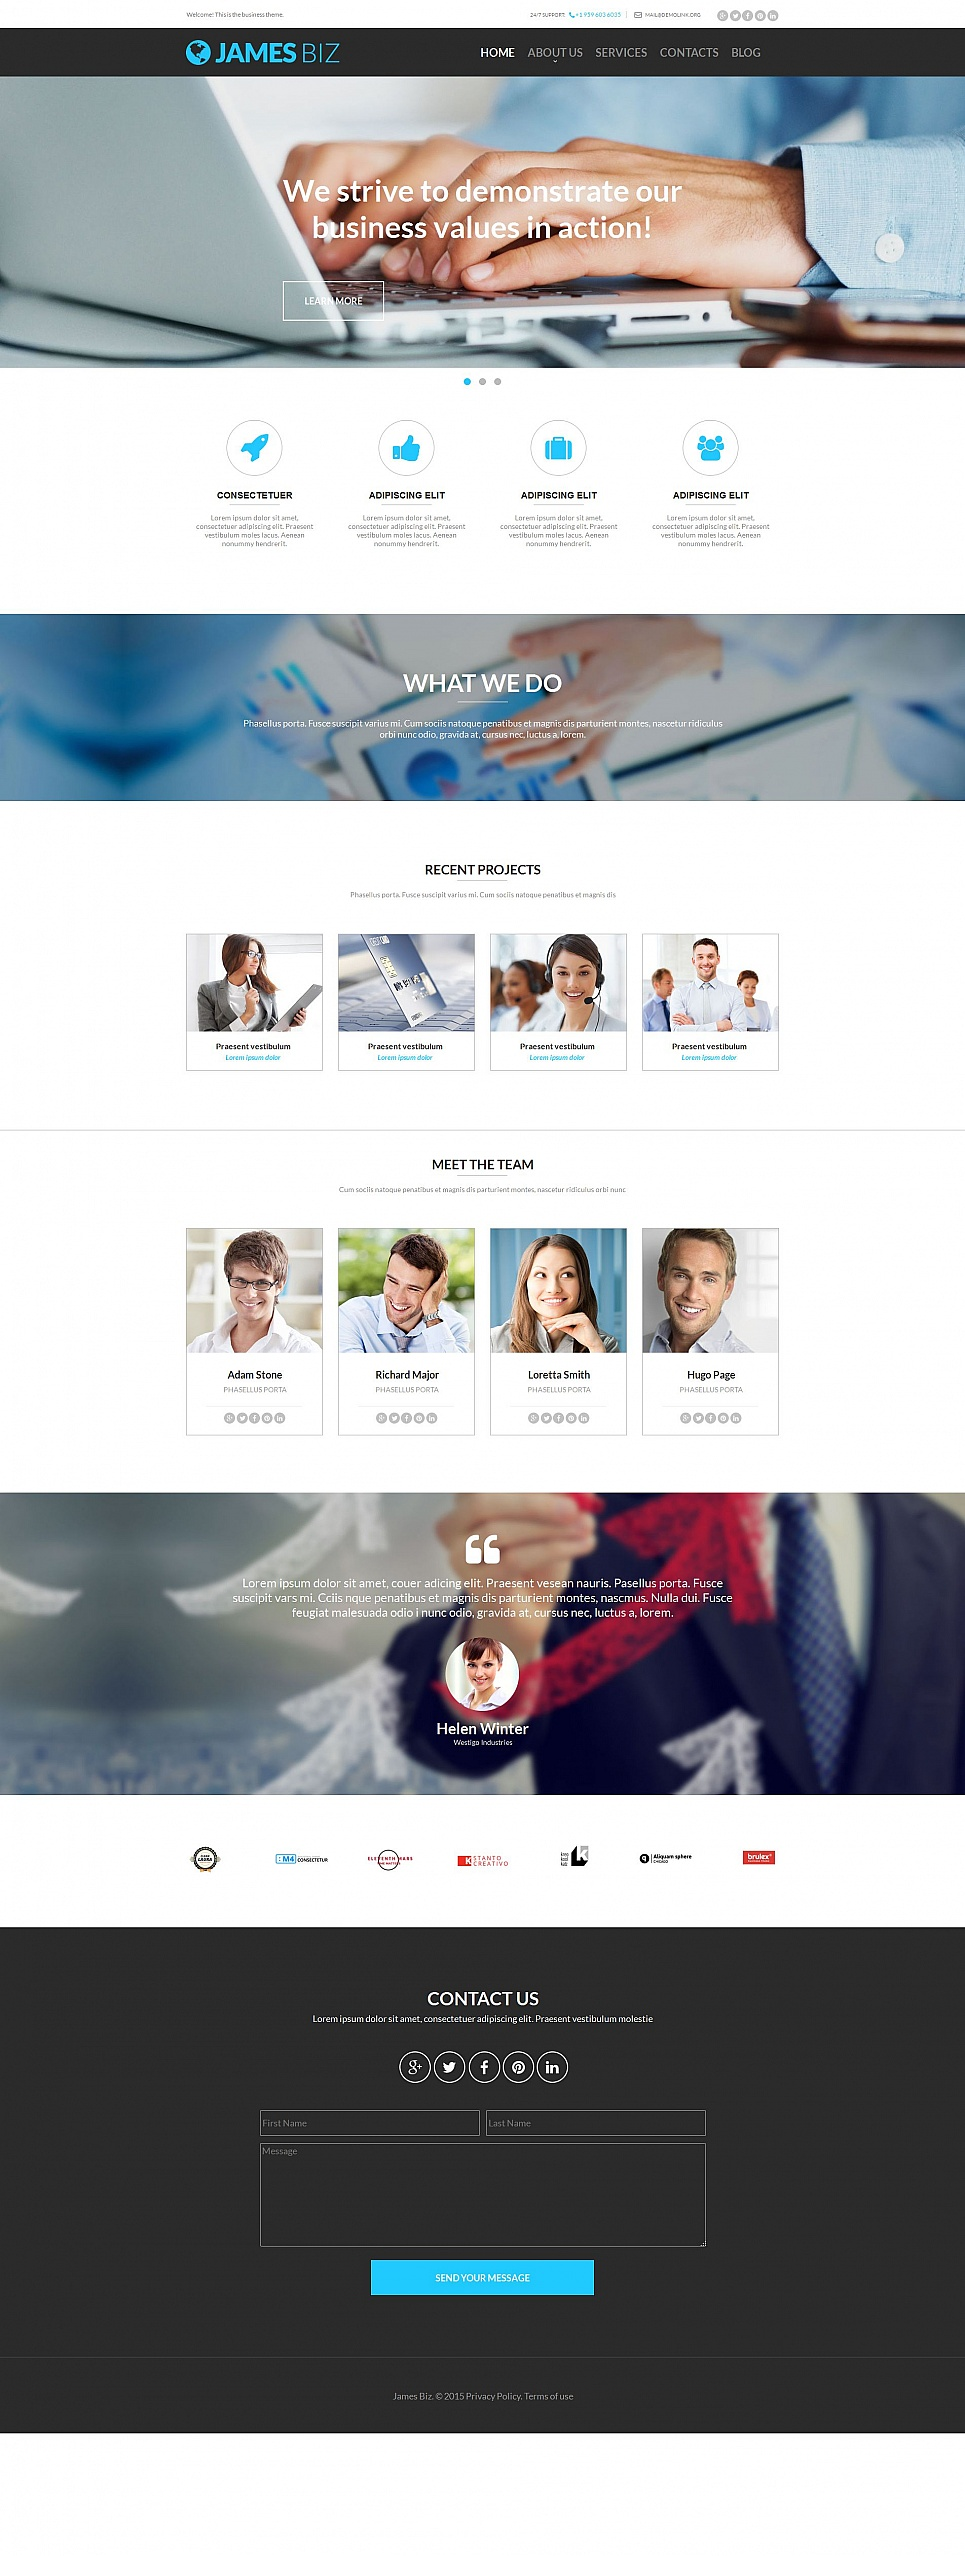 White background site for businessmen